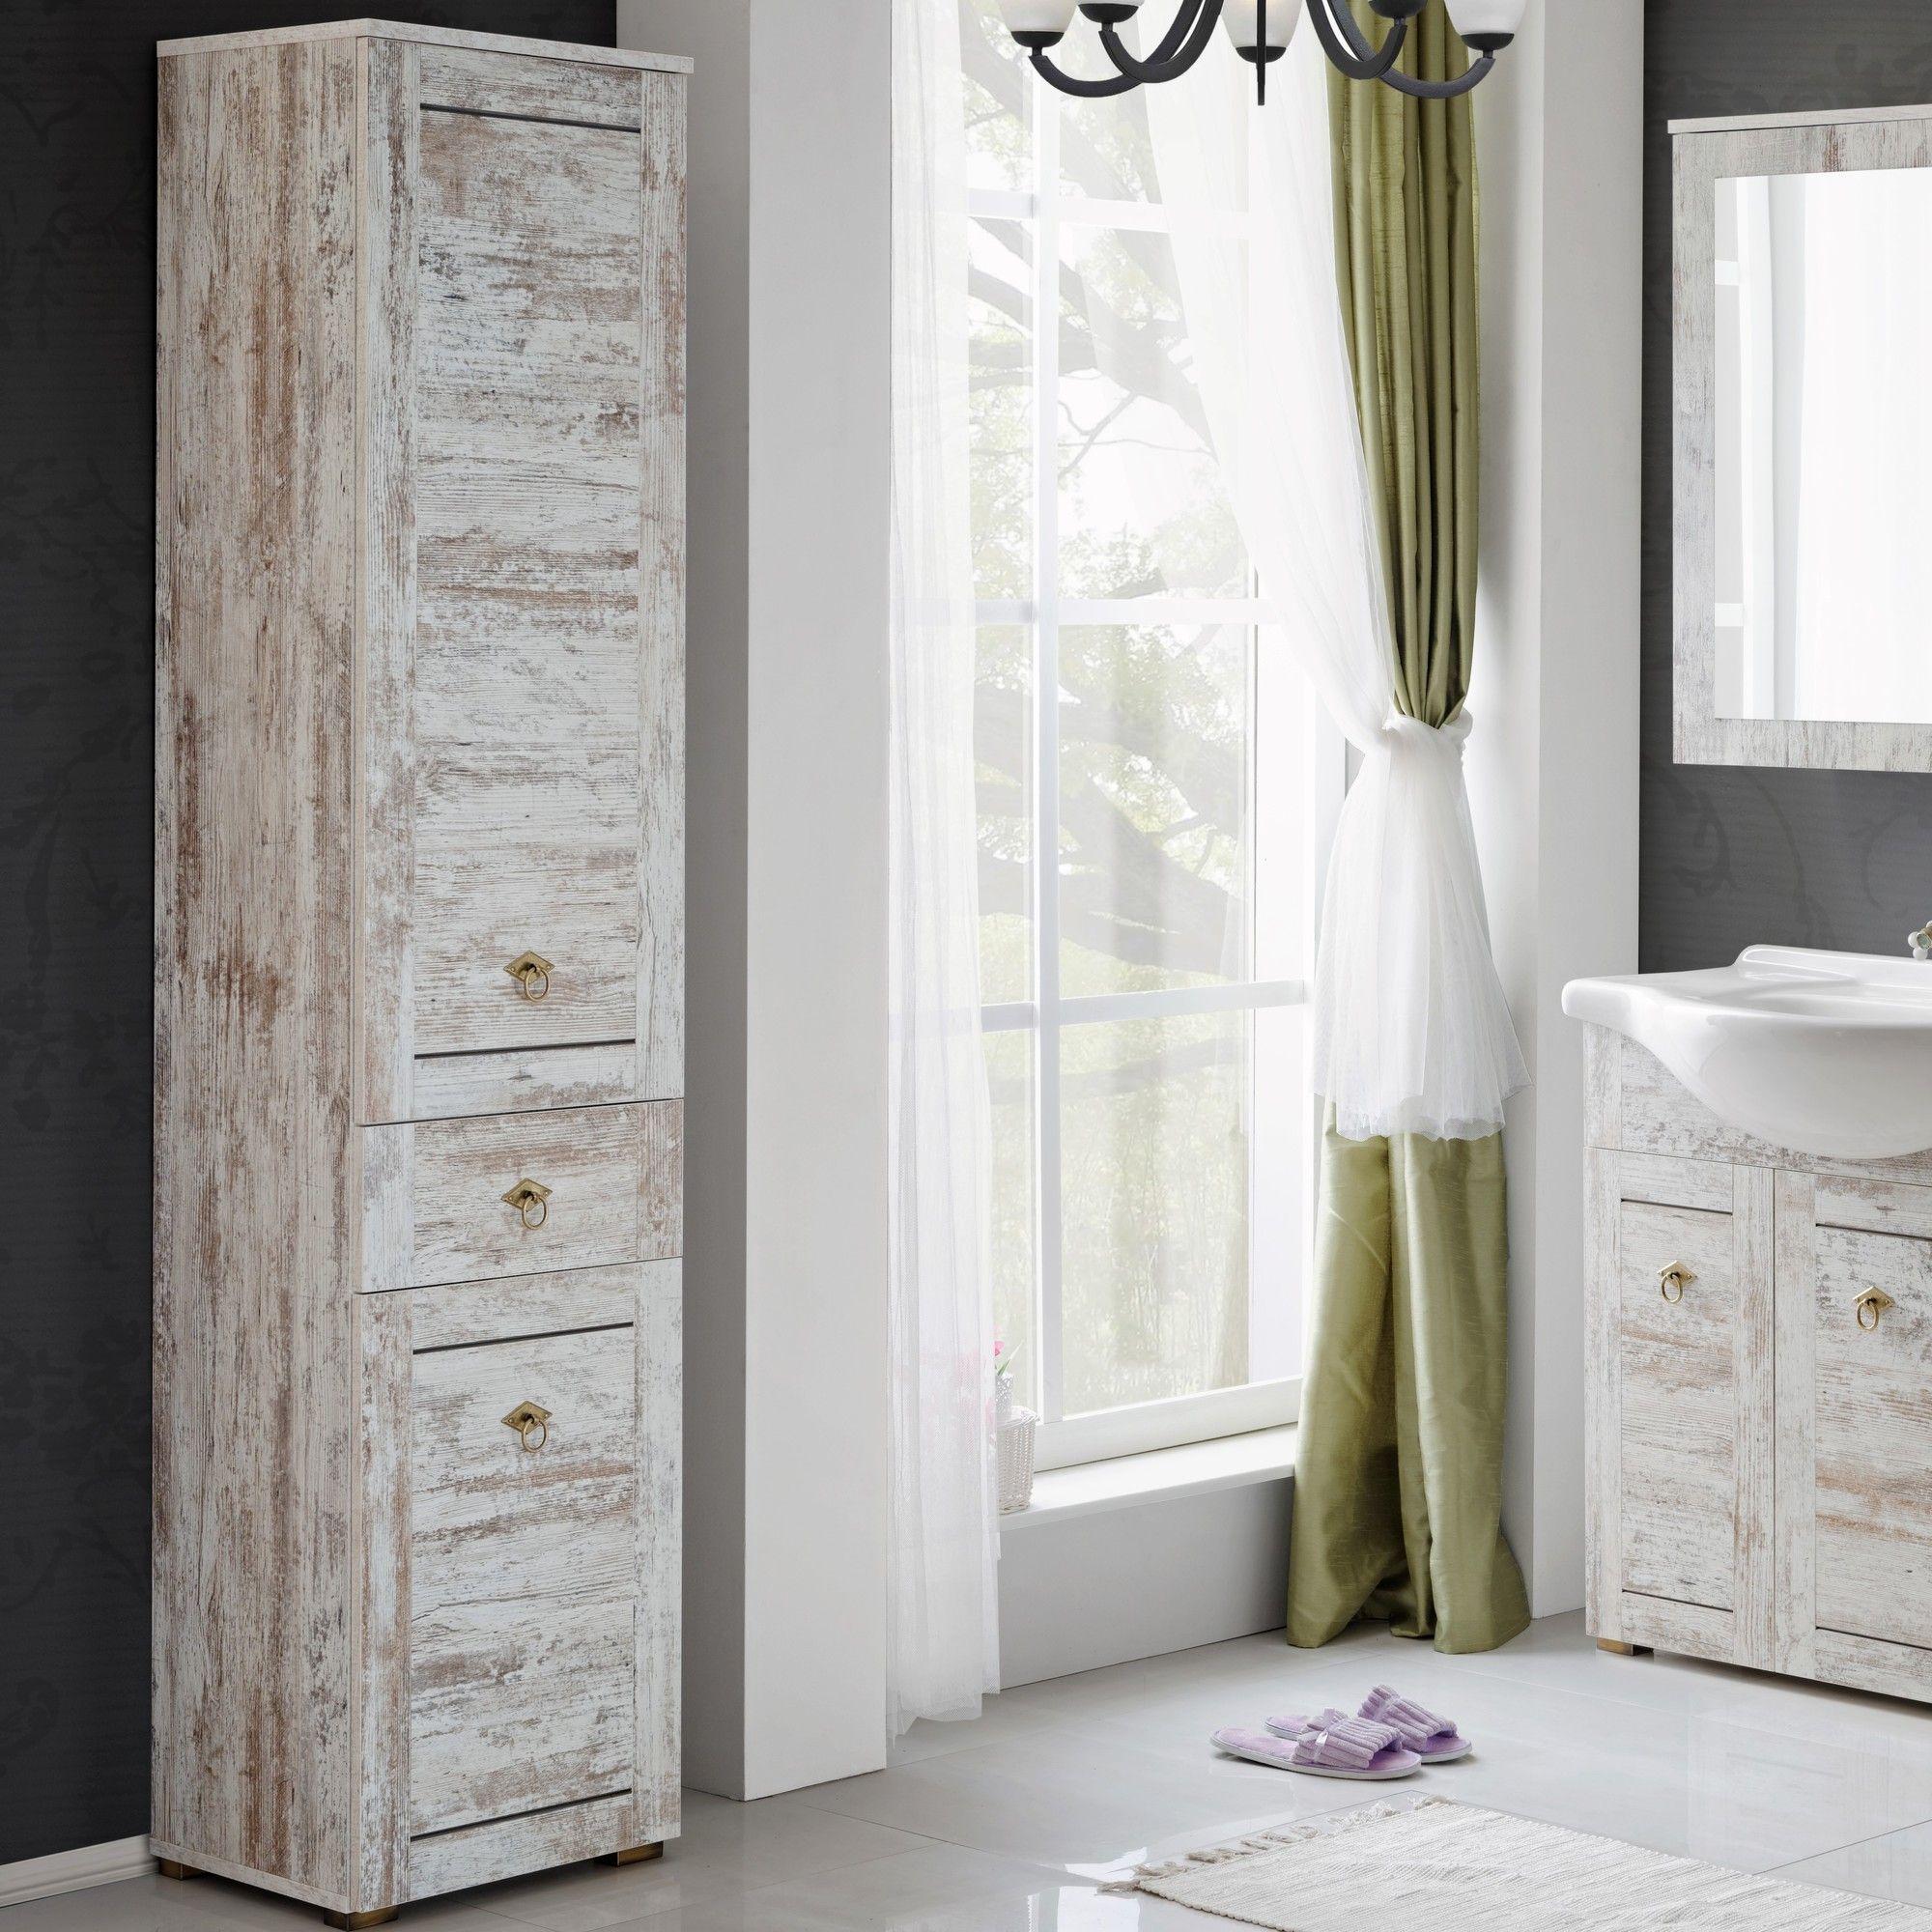 Fennel 40 x 185 cm Free Standing Tall Bathroom Cabinet | Wayfair UK ...